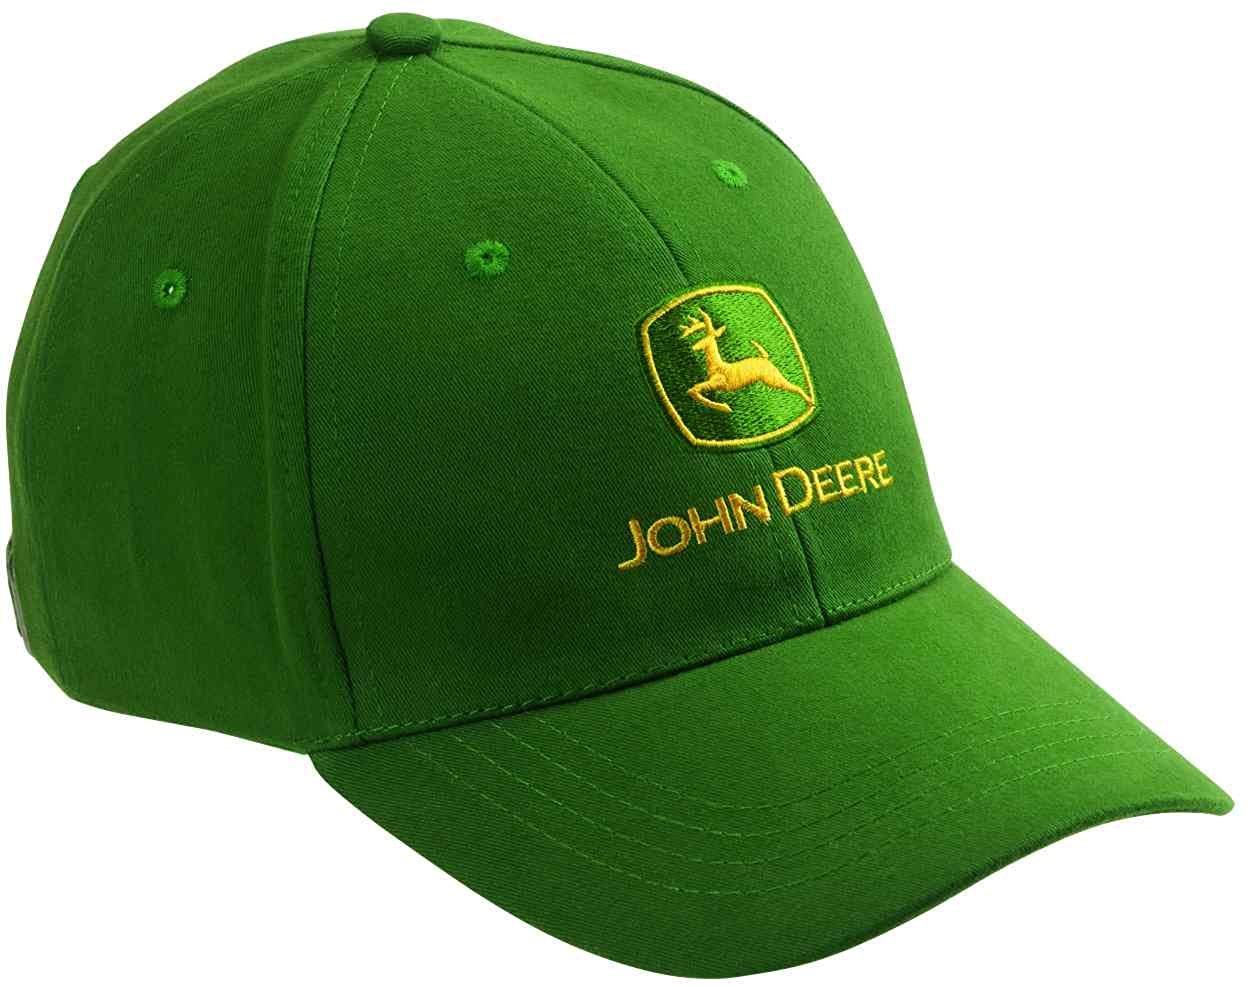 JOHN DEERE GREEN BASEBALL HAT CAP NOTHING RUNS LIKE A DEERE ...